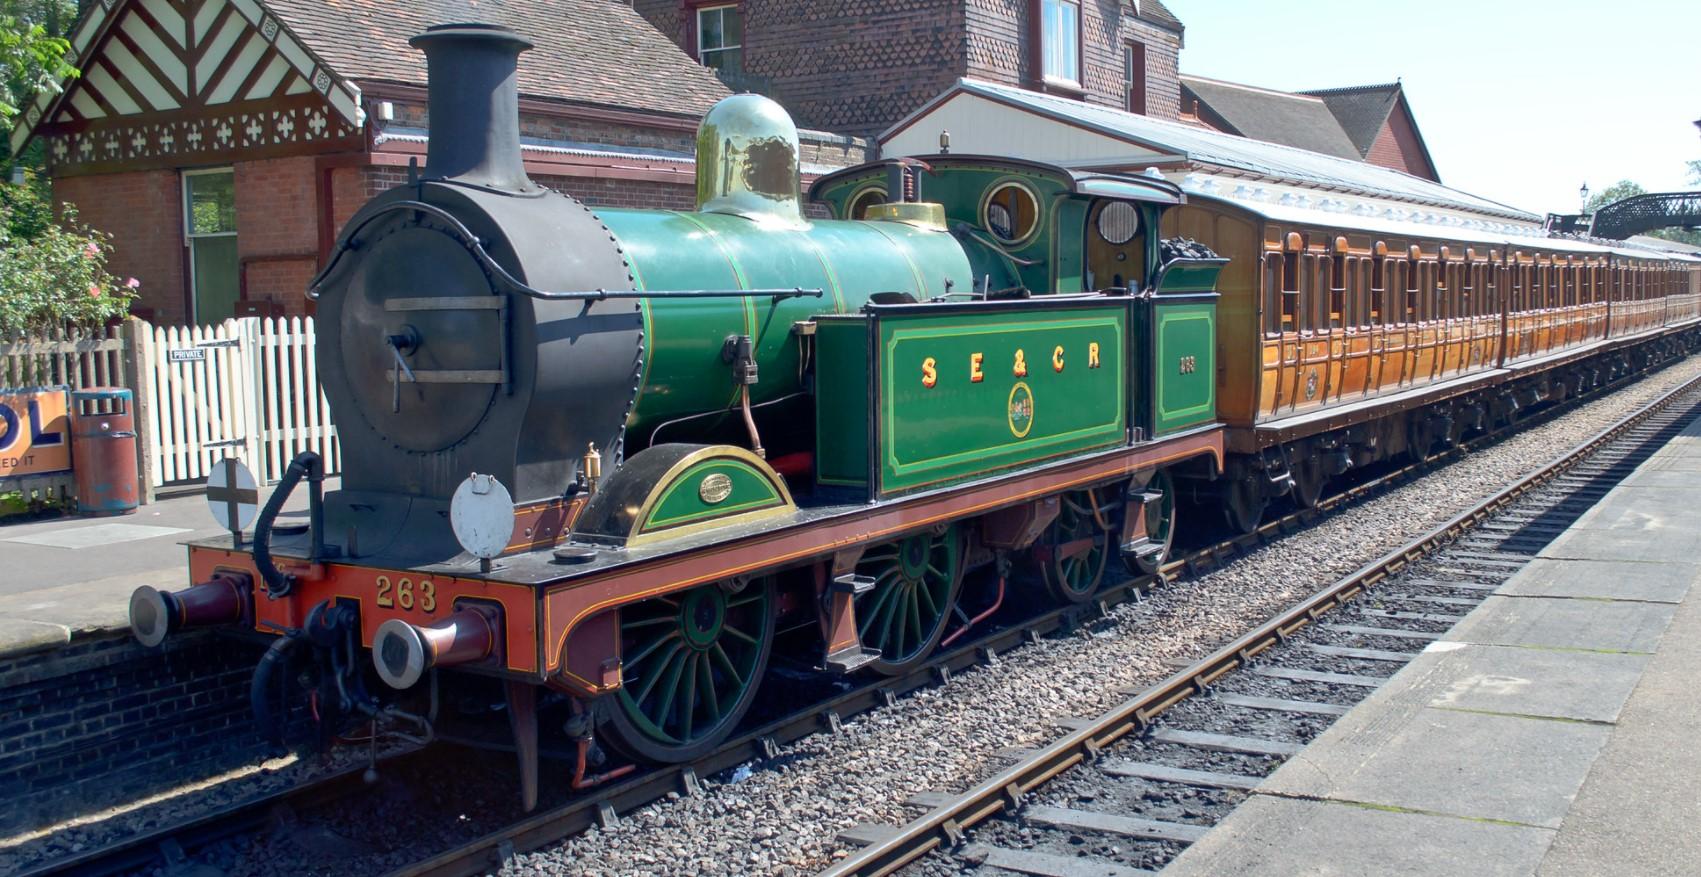 263 on the Bluebell Railway in August 2015. ©Dan Adkins